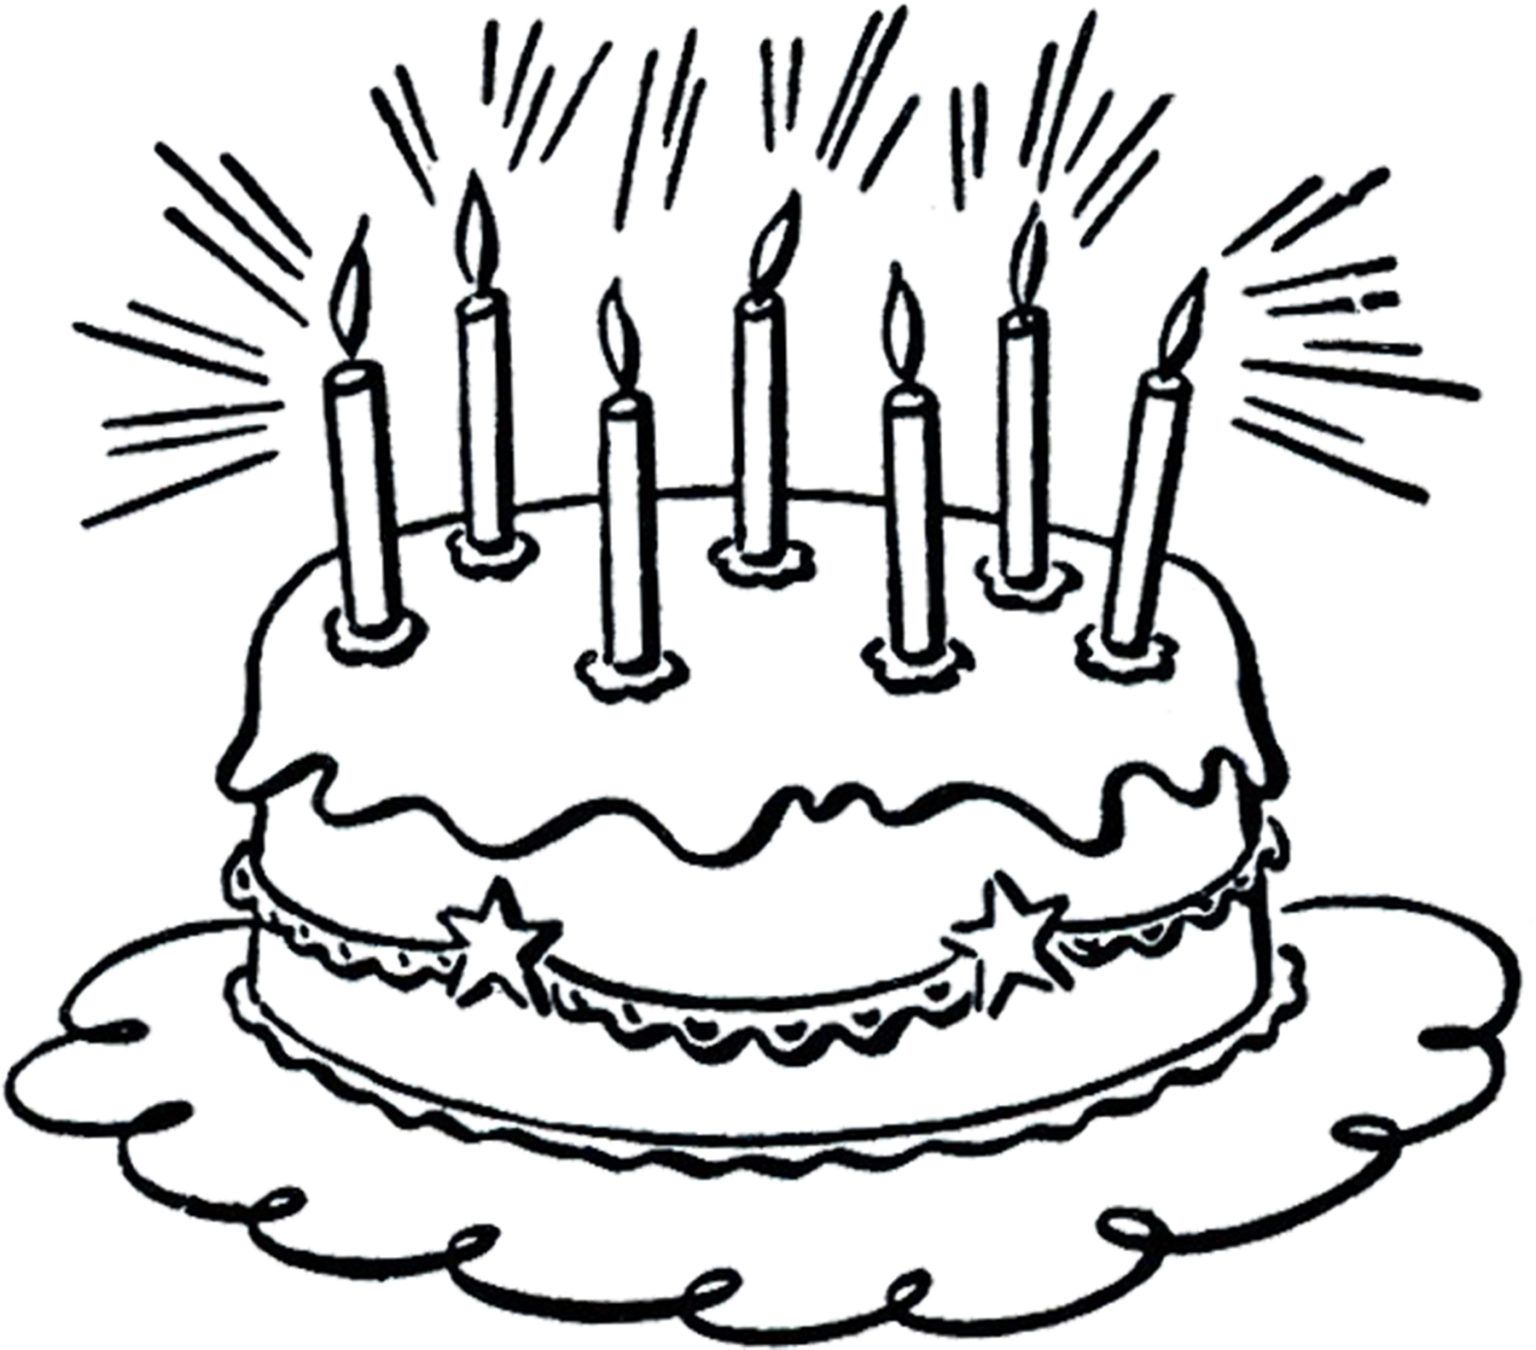 7 Birthday Cake Images Birthday Cake Clip Art Art Birthday Cake Birthday Cake Illustration